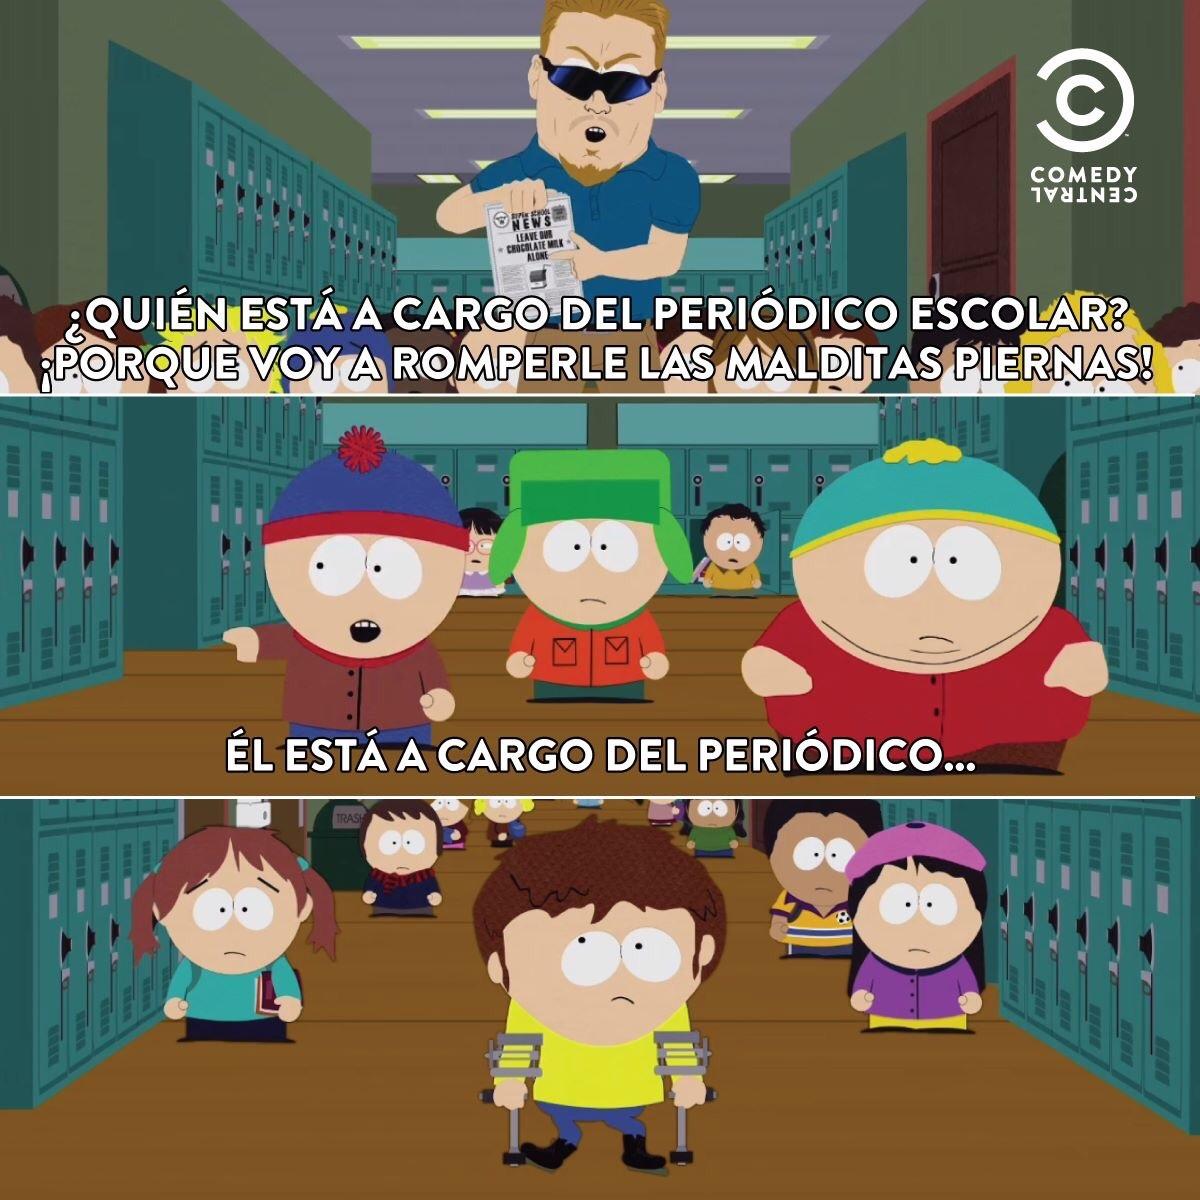 jajajaja simplemente south park v meme by marcelo28 memedroid